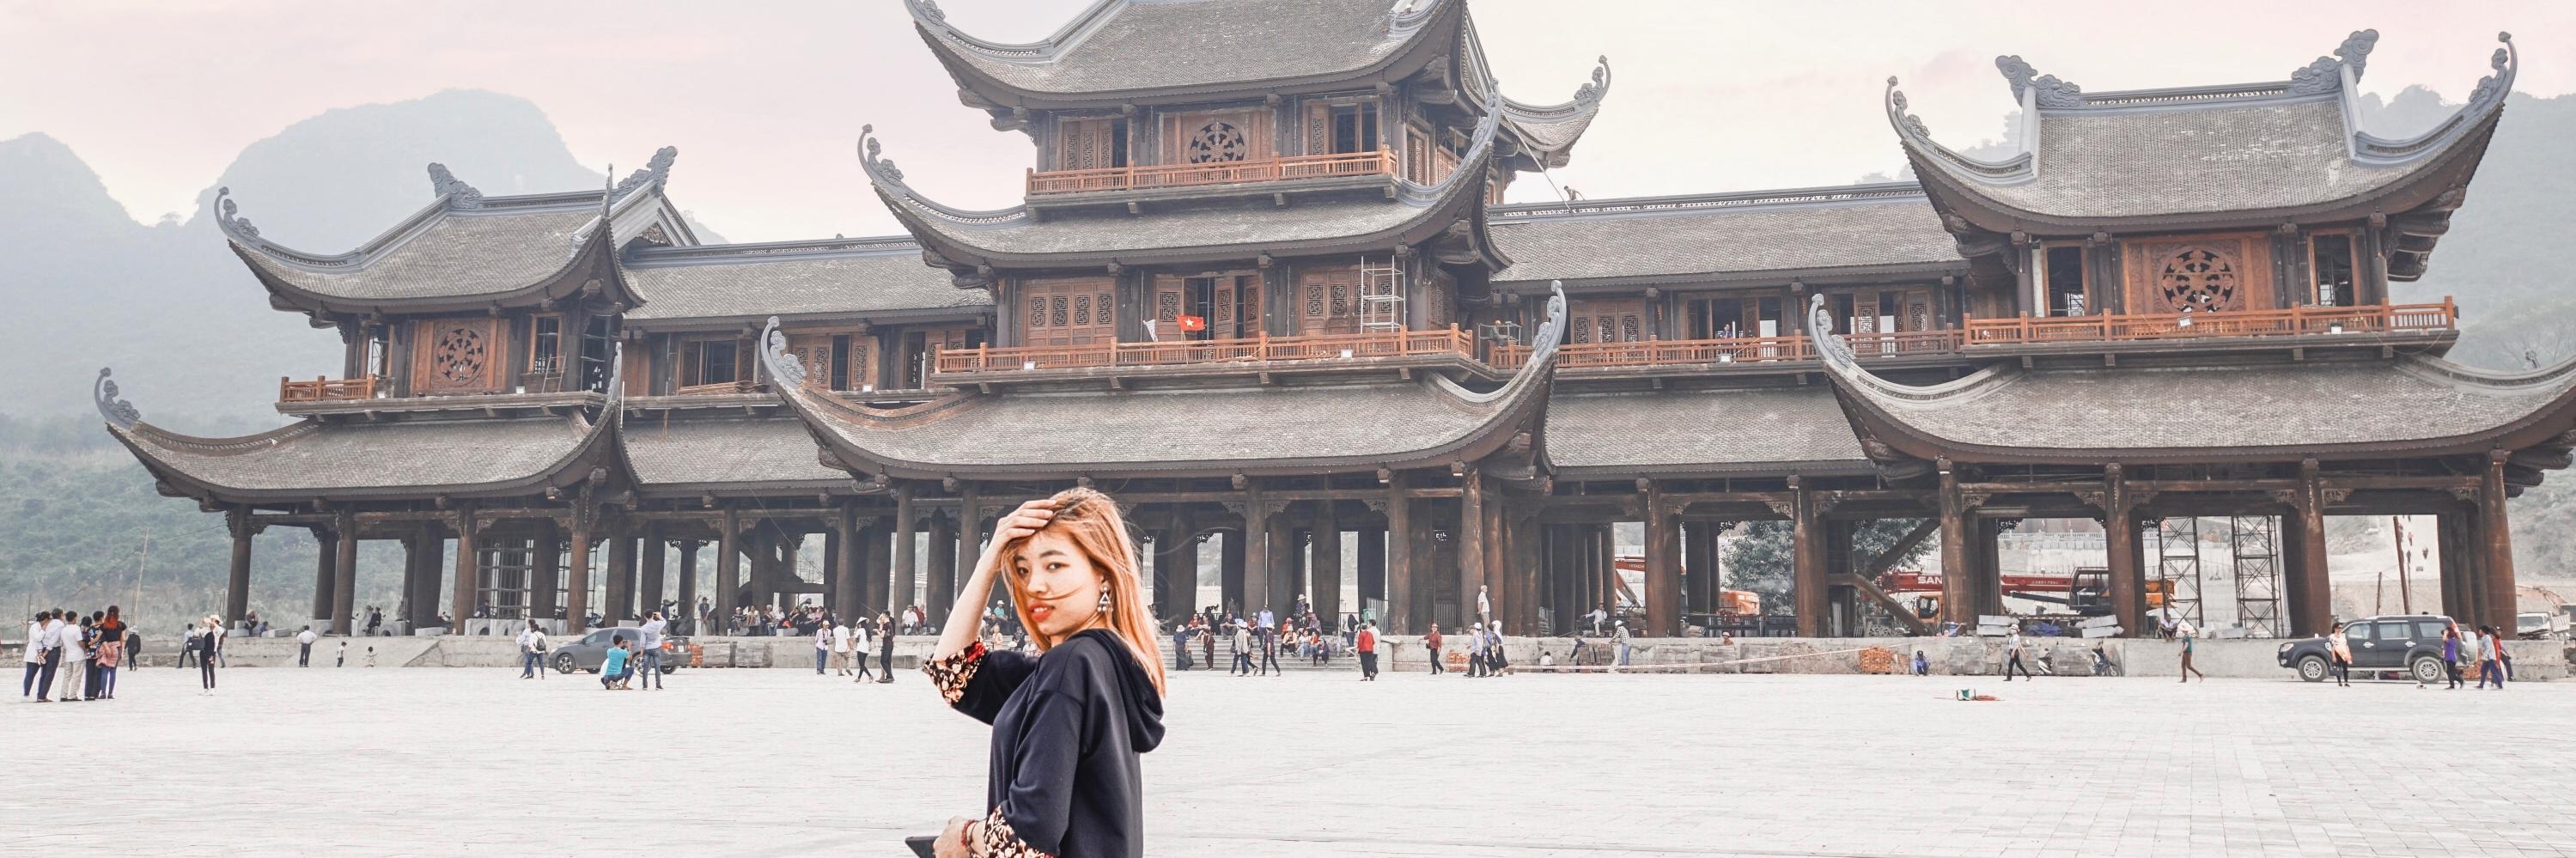 https://gody.vn/blog/min.263965148/post/chua-tam-chuc-chon-bong-lai-tien-canh-giua-tran-gian-2976